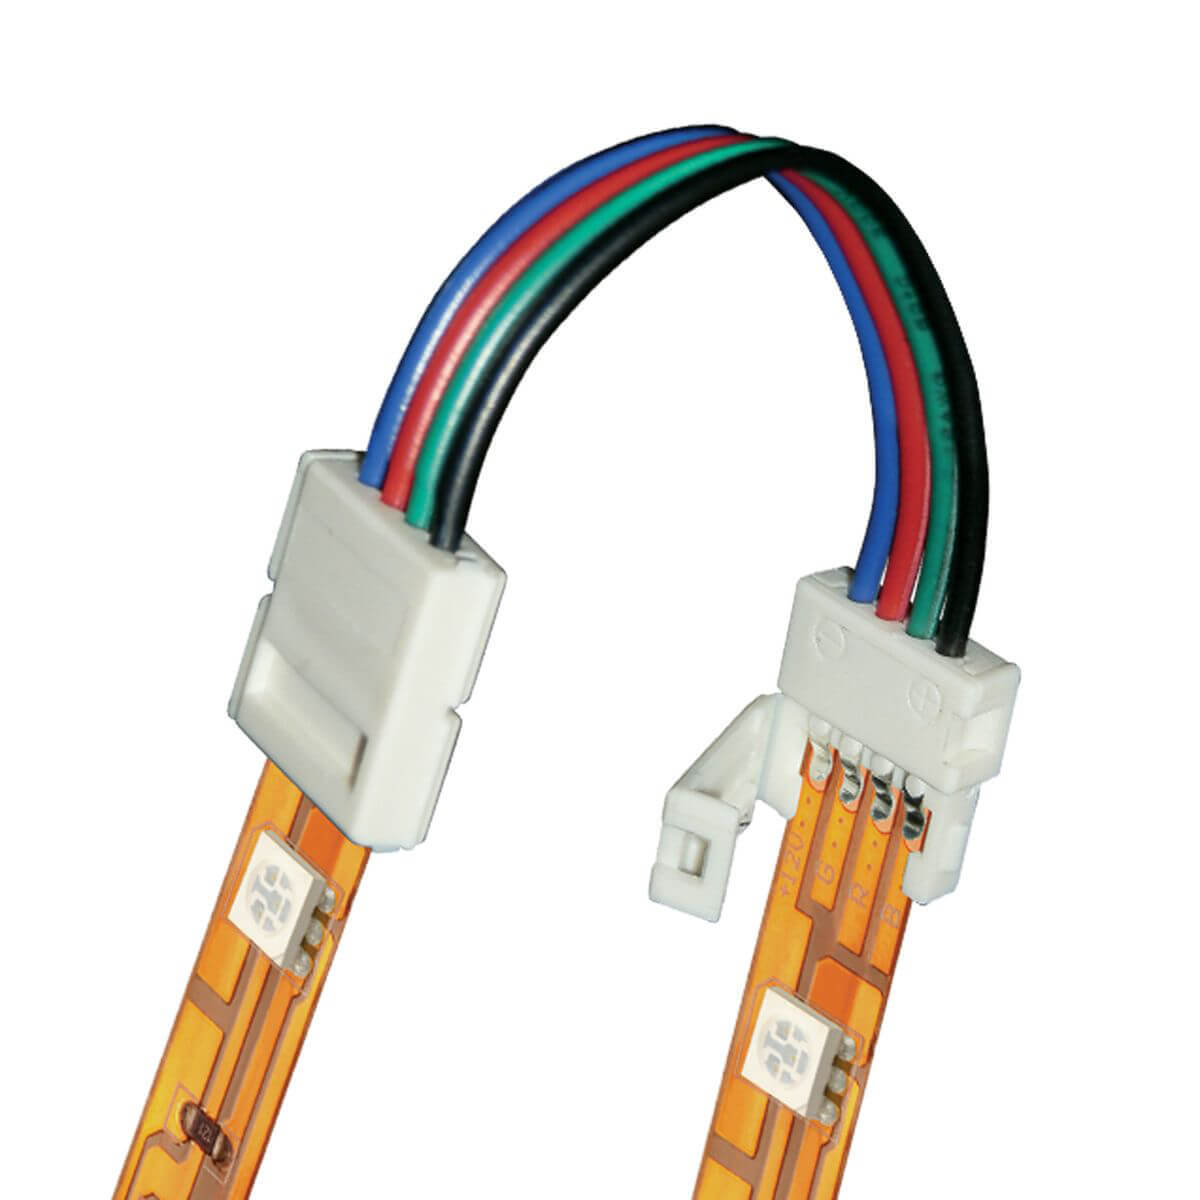 Коннектор для светодиодных лент (06613) Uniel UCX-SS4/B20-RGB White 020 цена и фото